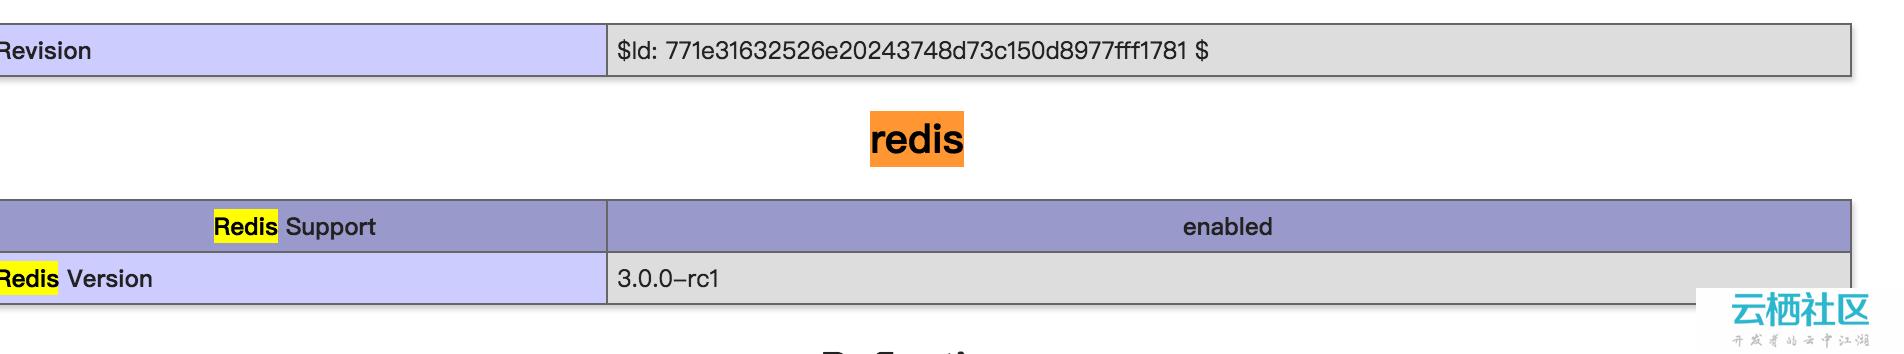 在mamp上php7.0.x和php5.6.x安装拓展redis-